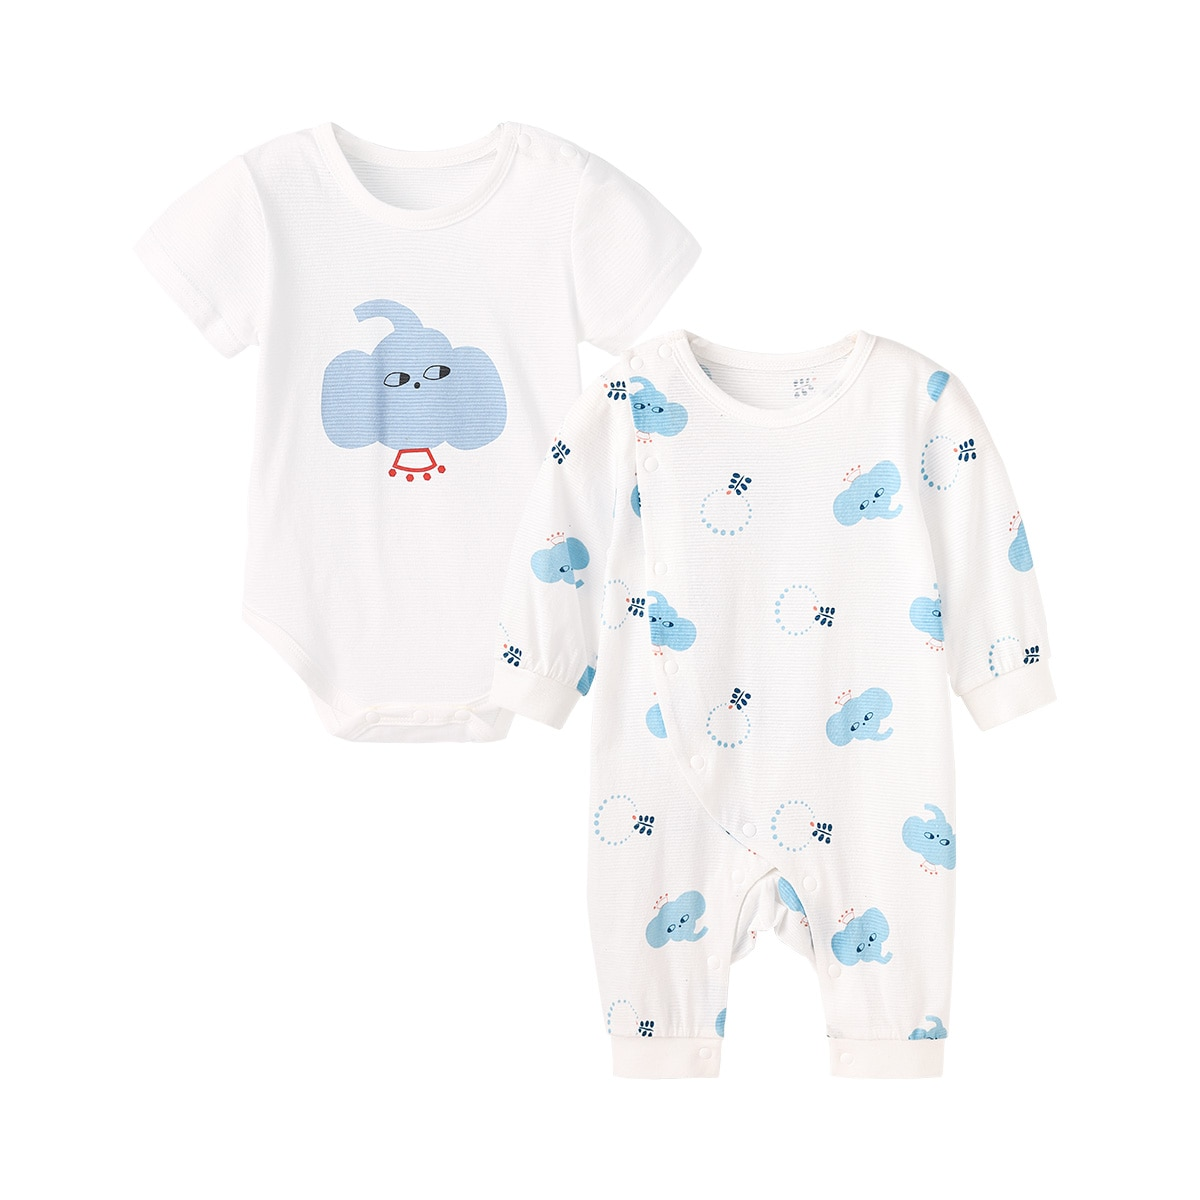 Pureborn 2 Pcs Baby Bodysuit Jumpsuit Cartoon Elephant Adorable Baby Boy Girl Clothes Breathable Cotton Summer Outfit